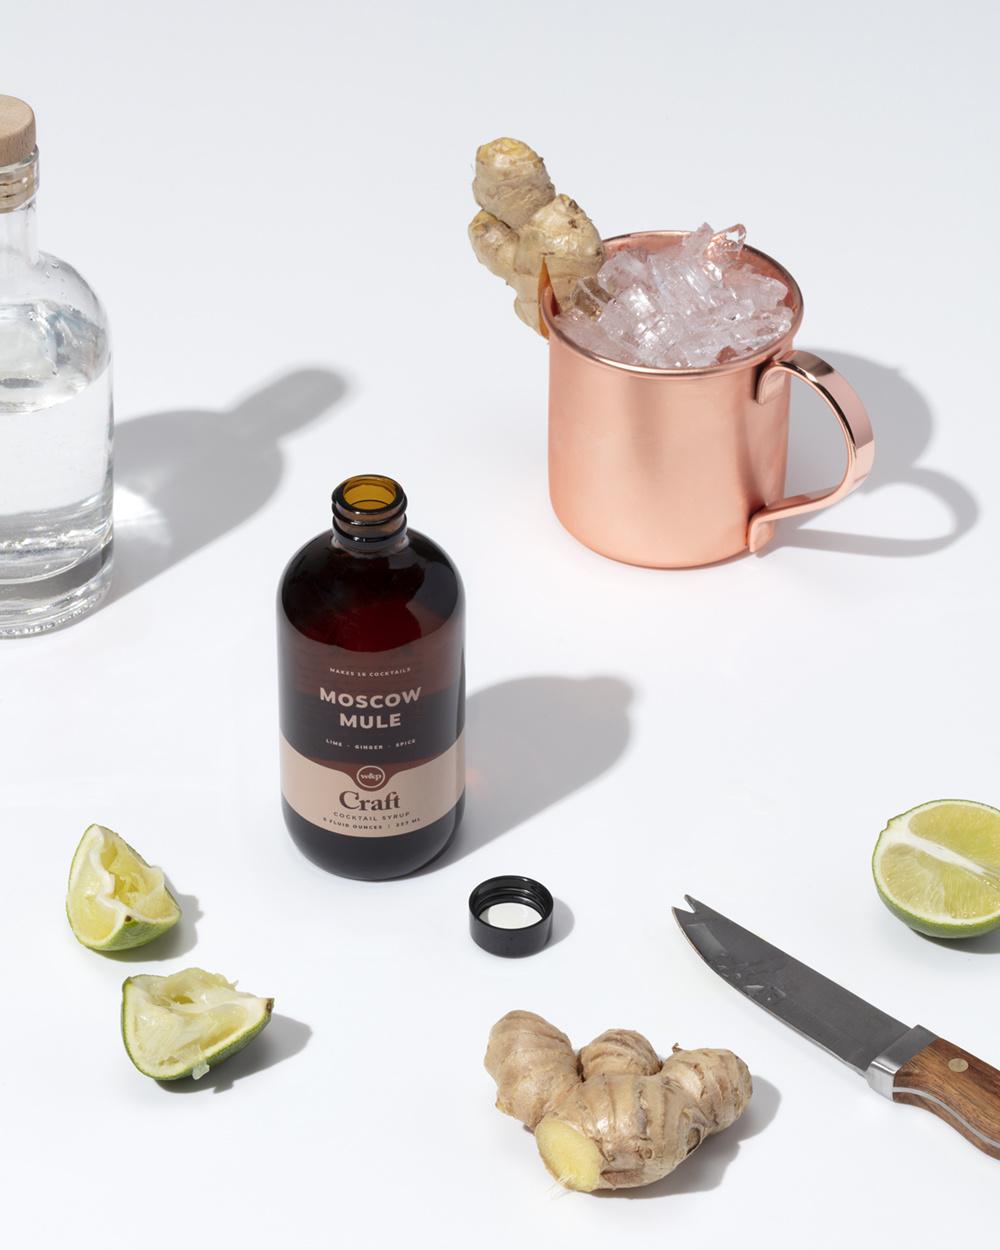 4 Masks, 1 Set of Cocktail Mixers, 1 Kush Candle, 2 Bath Bombs 200 mg CBD